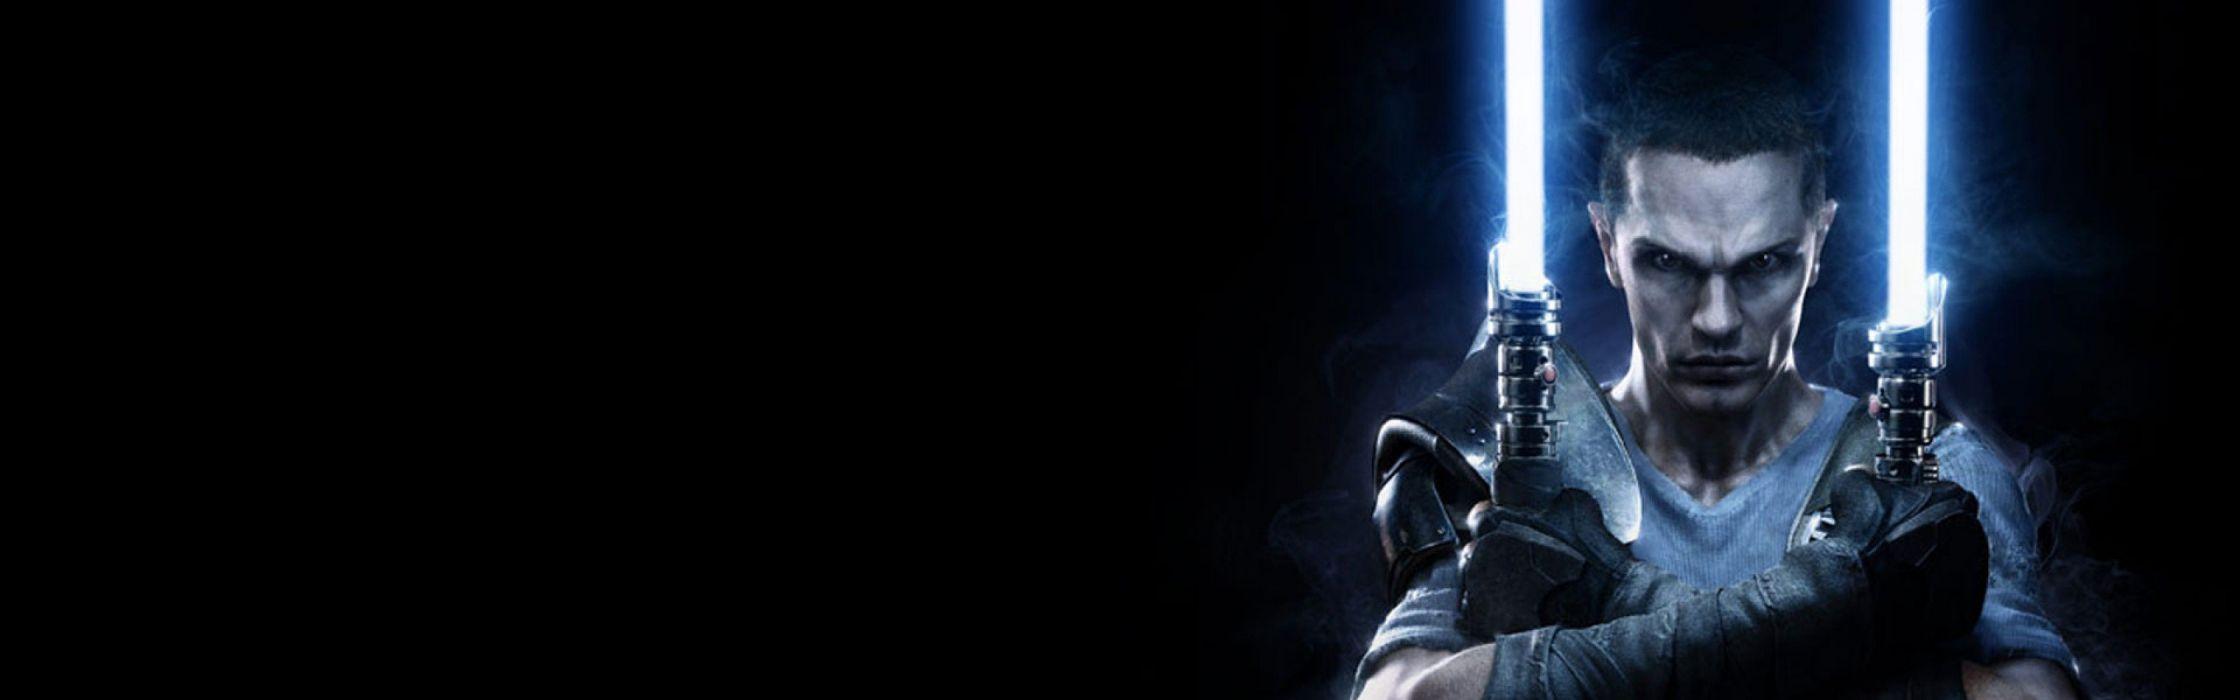 STAR WARS FORCE AWAKENS action adventure futuristic science sci-fi 1star-wars-force-awakens warrior jedi weapon wallpaper